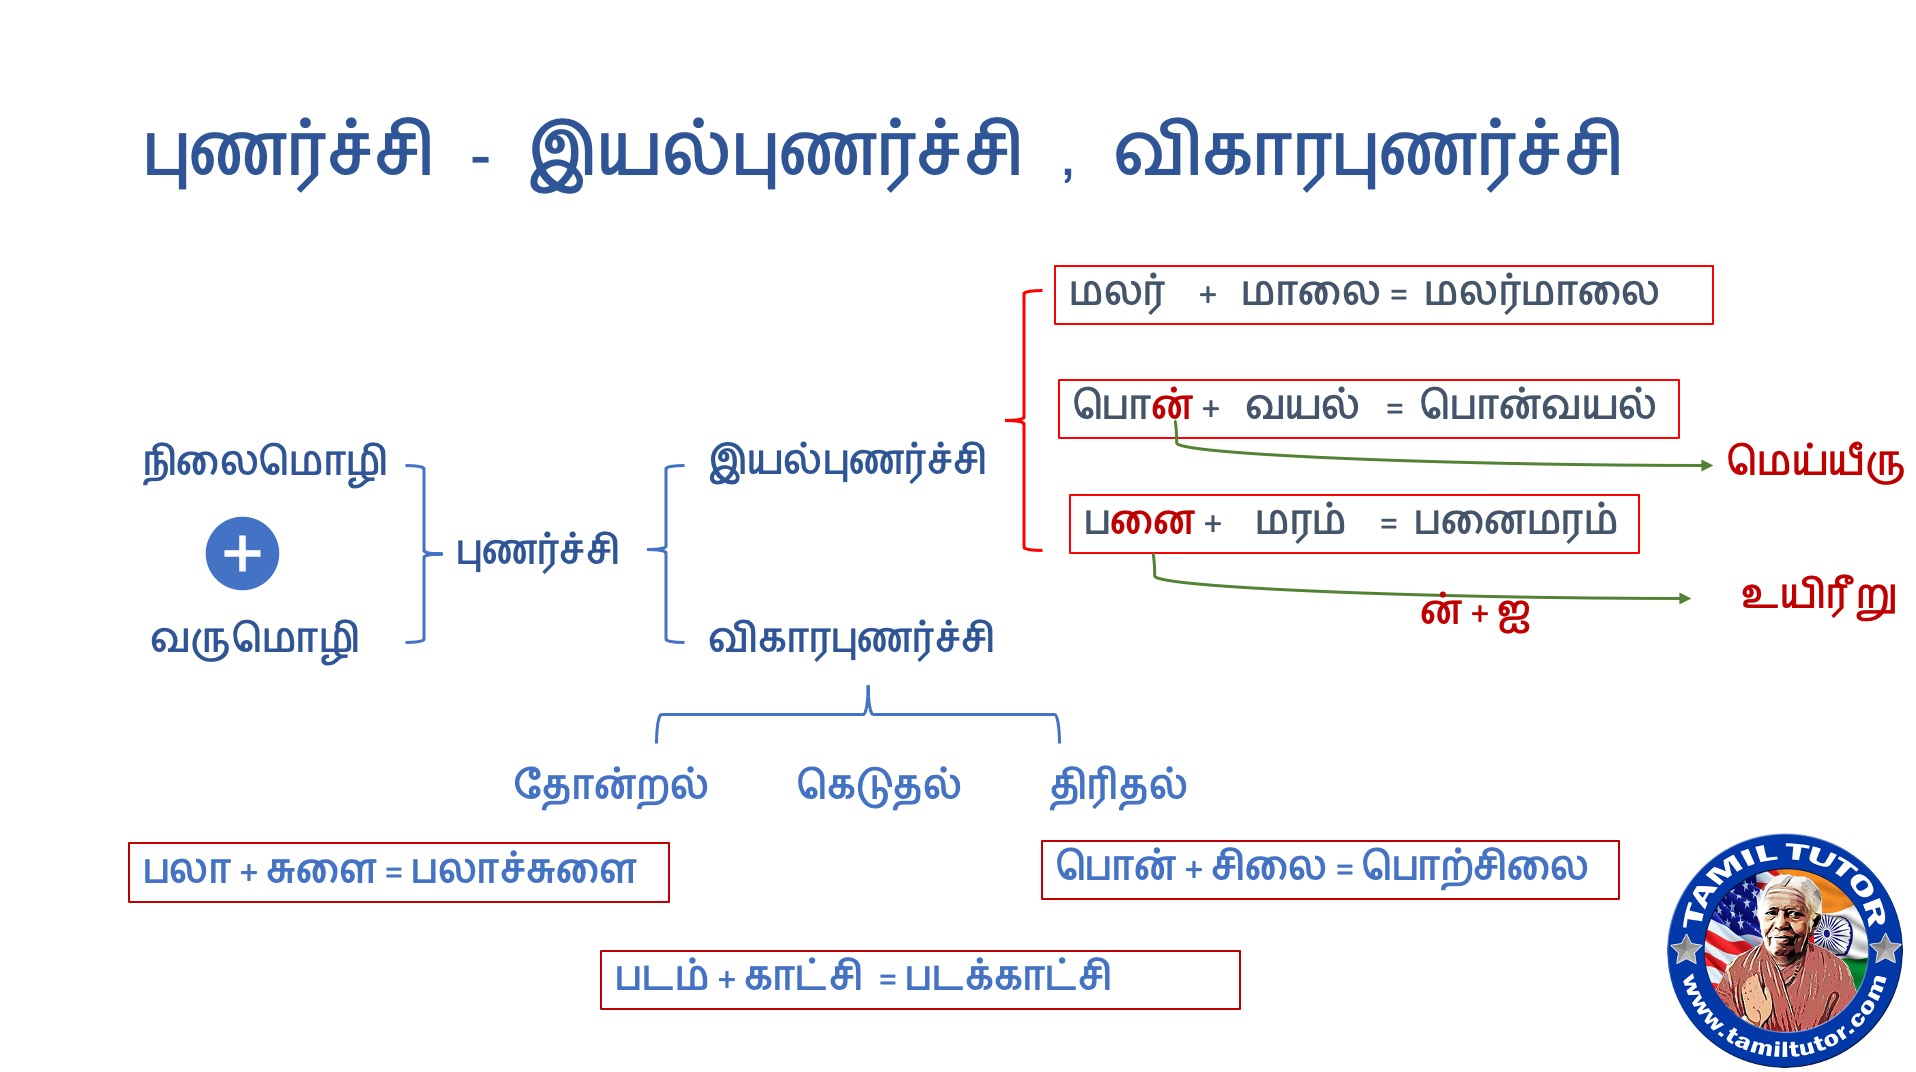 Punarchi - Tamil Grammar